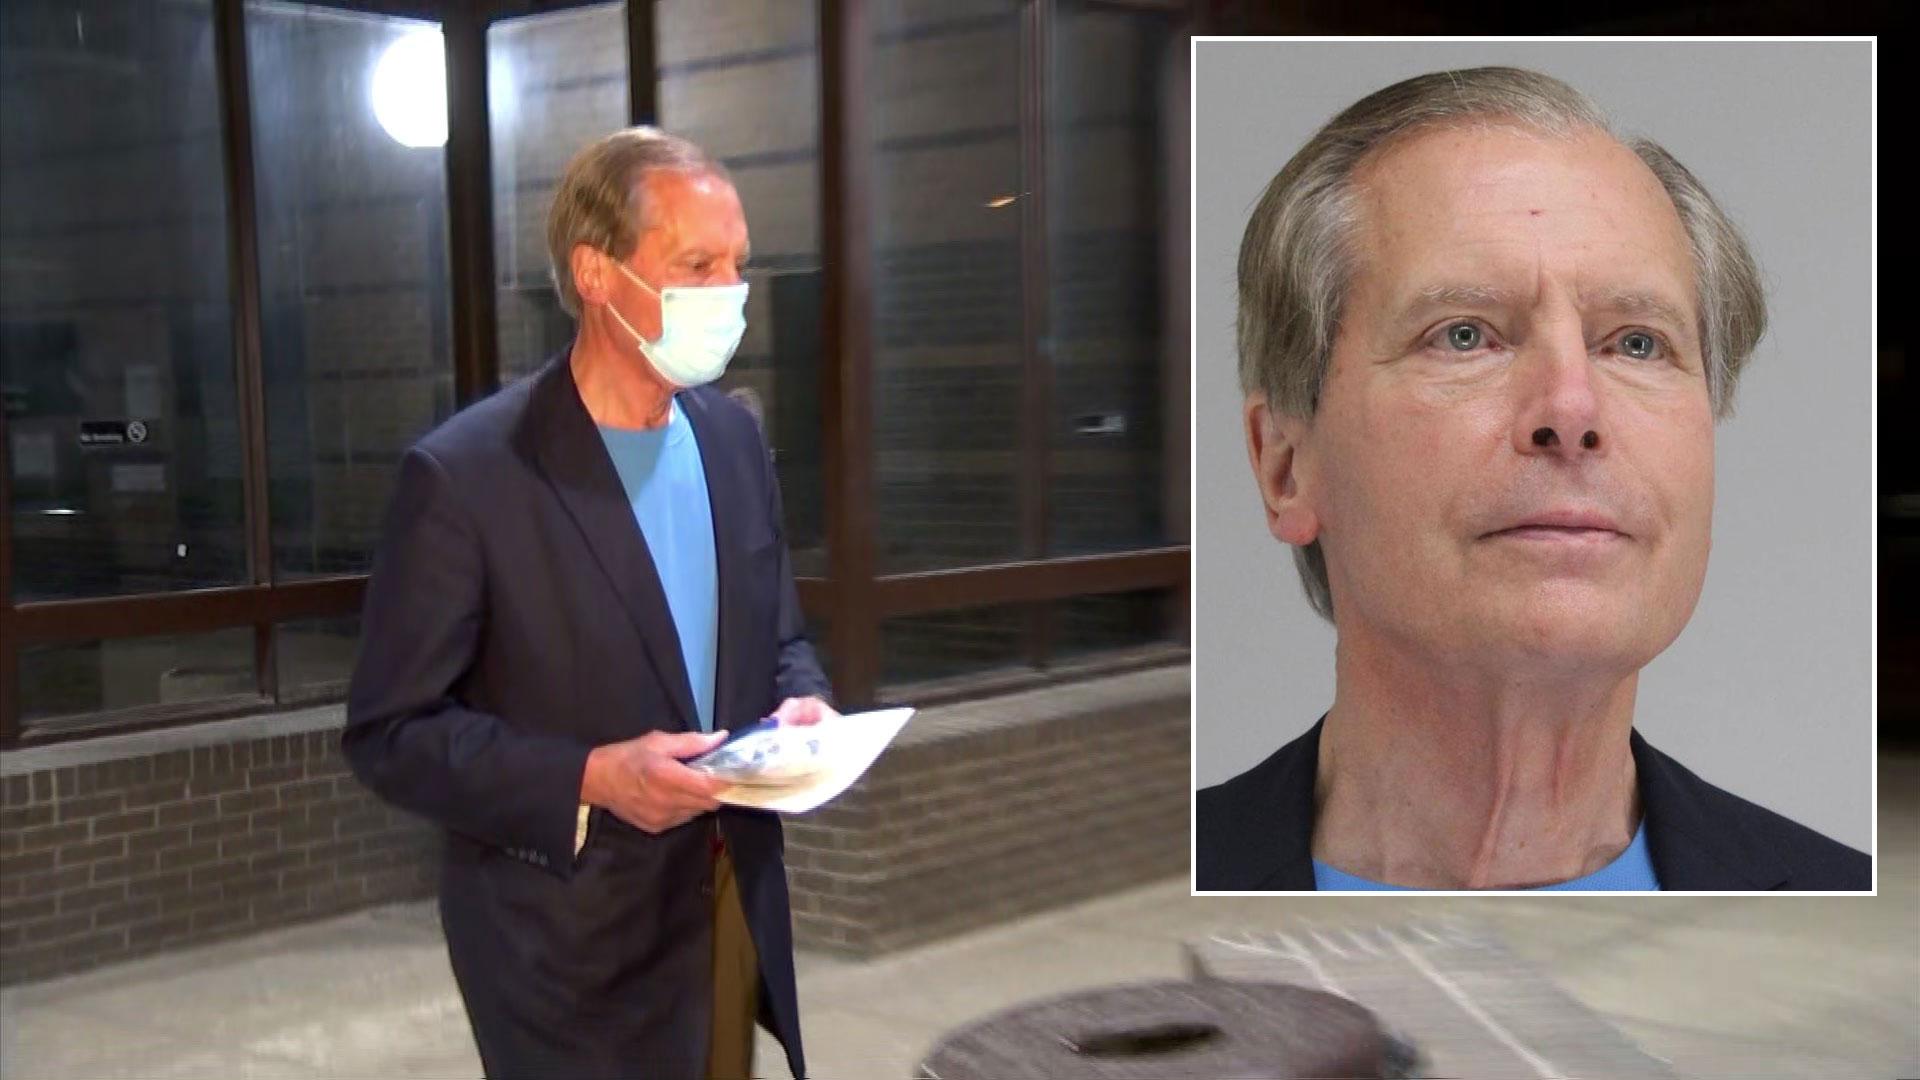 Former Texas Lt. Gov. David Dewhurst Arrested in Dallas on Domestic Violence Charge